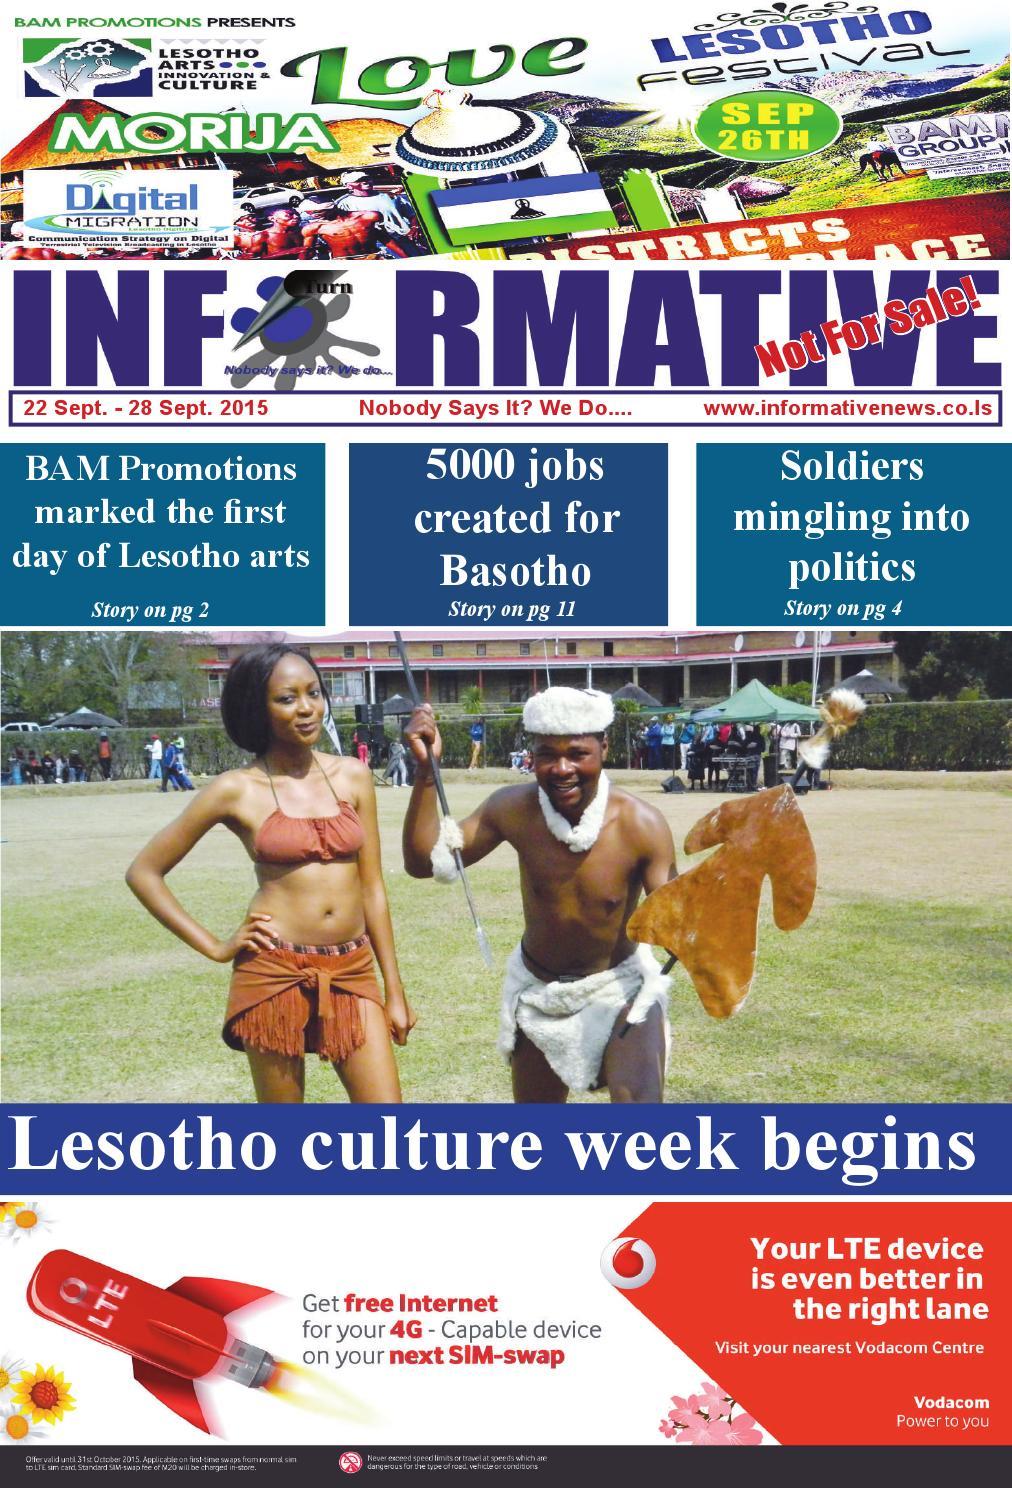 Informative news 22 28 sept 2015 by BAM Media - issuu